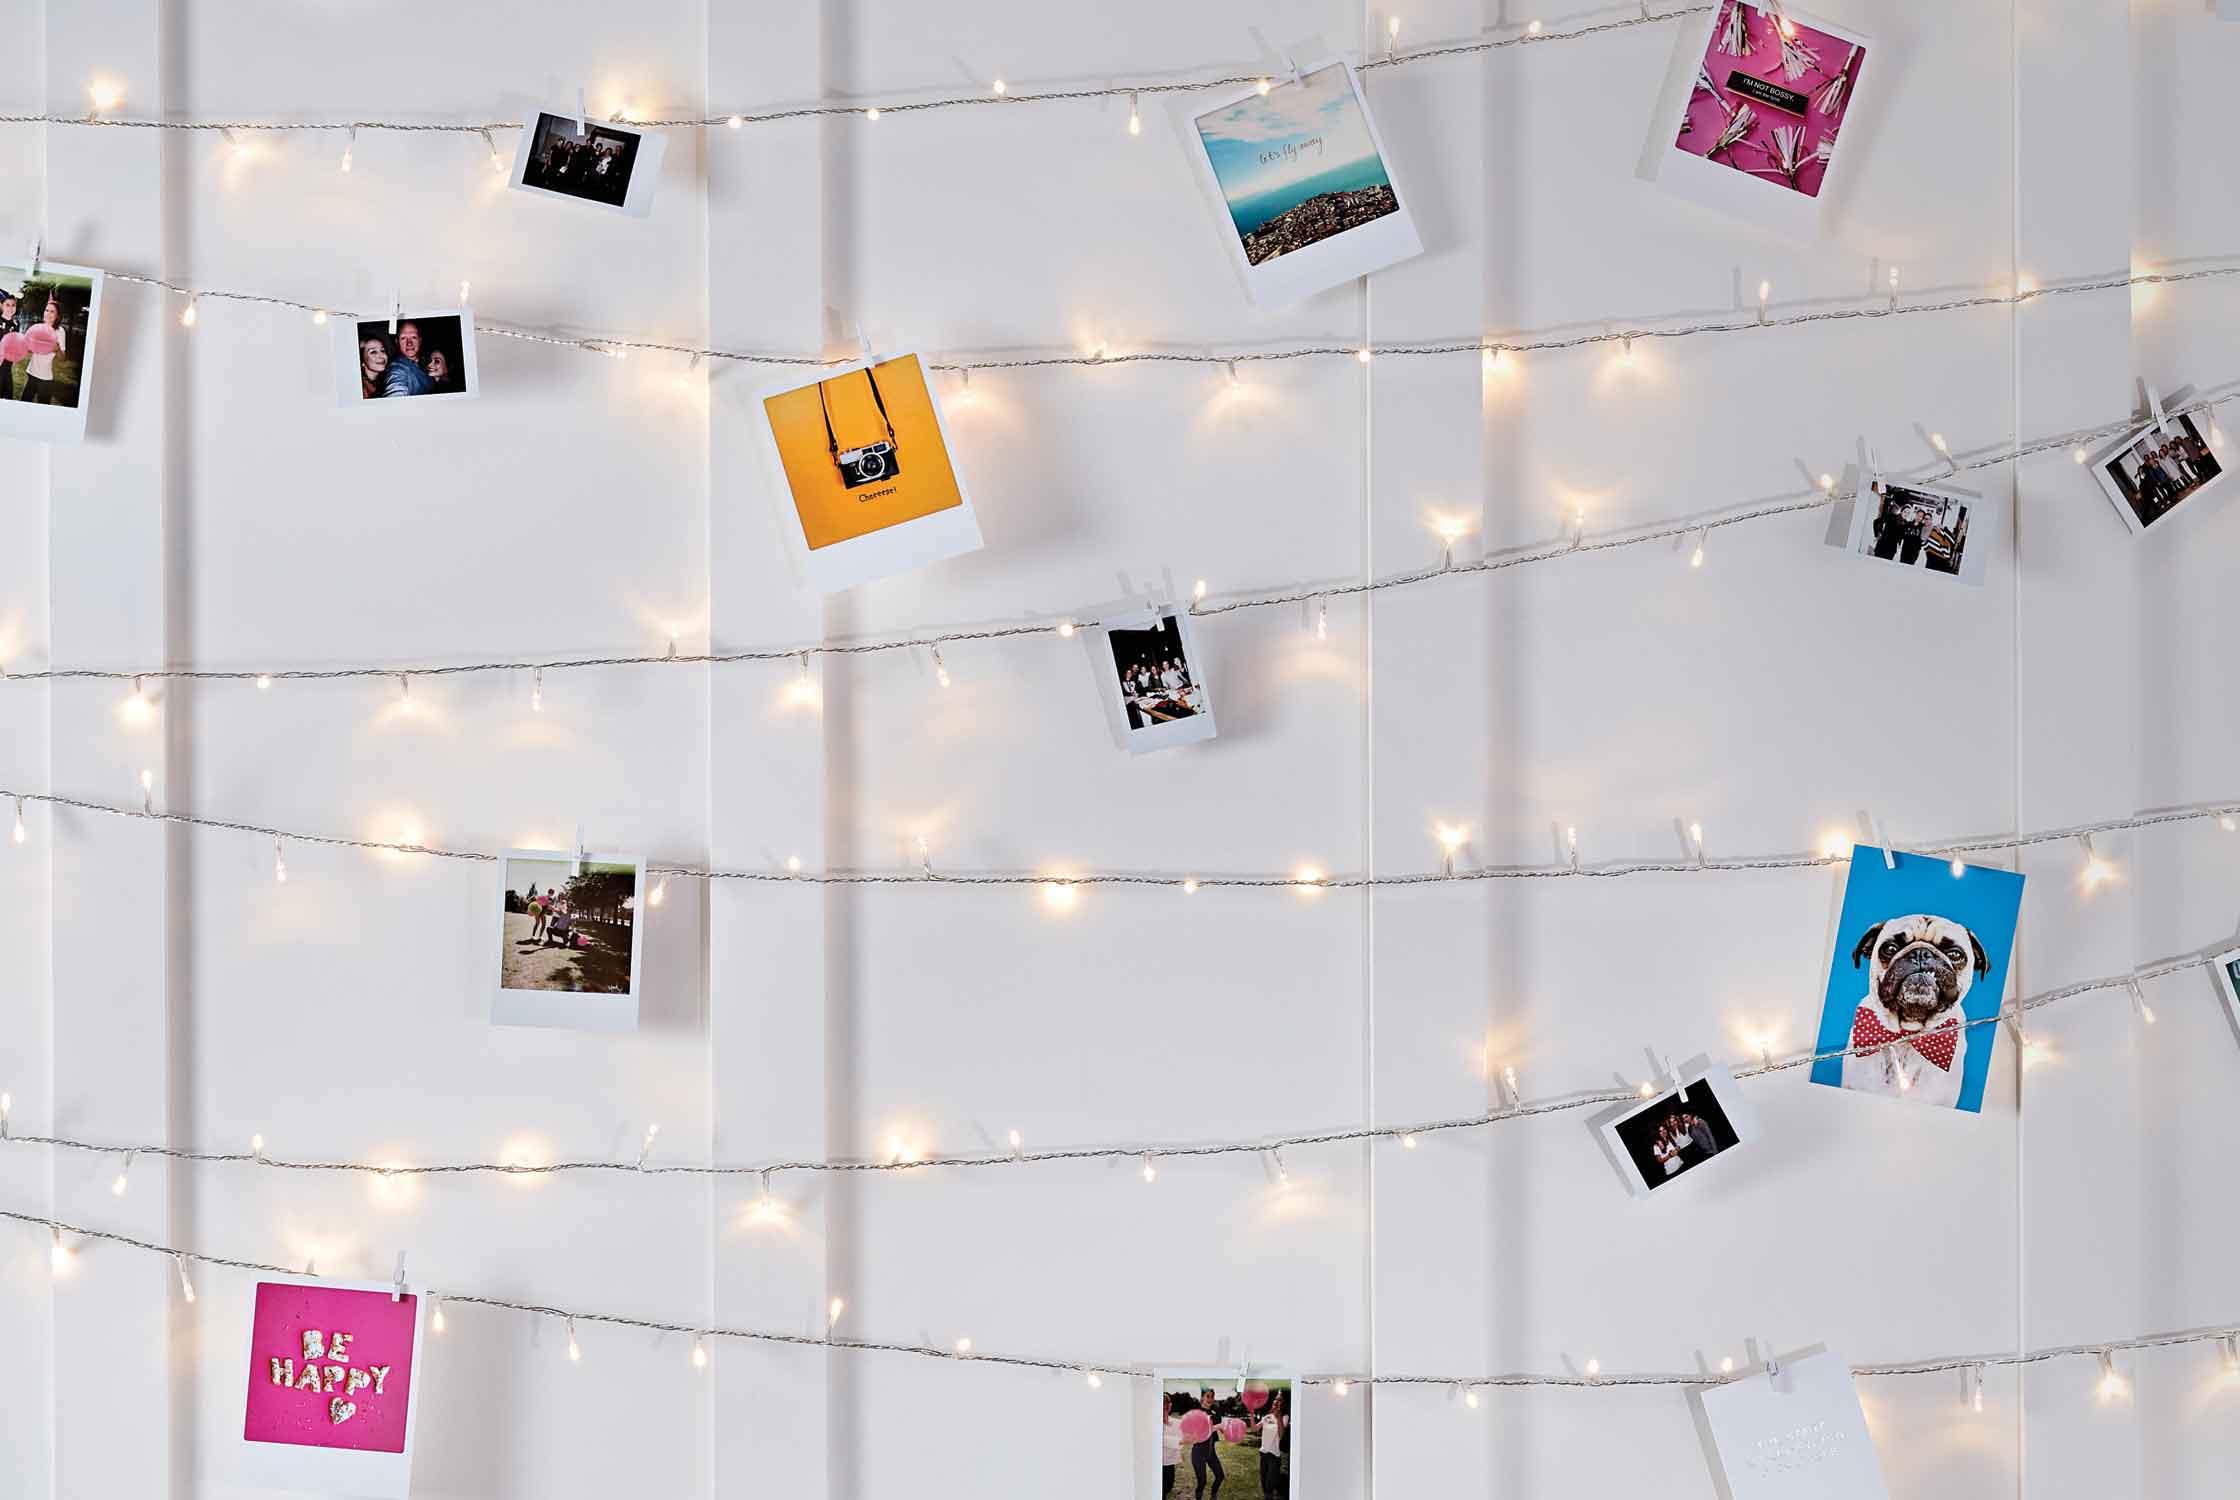 Bedroom Fairy Light Ideas   Lights4fun.co.uk